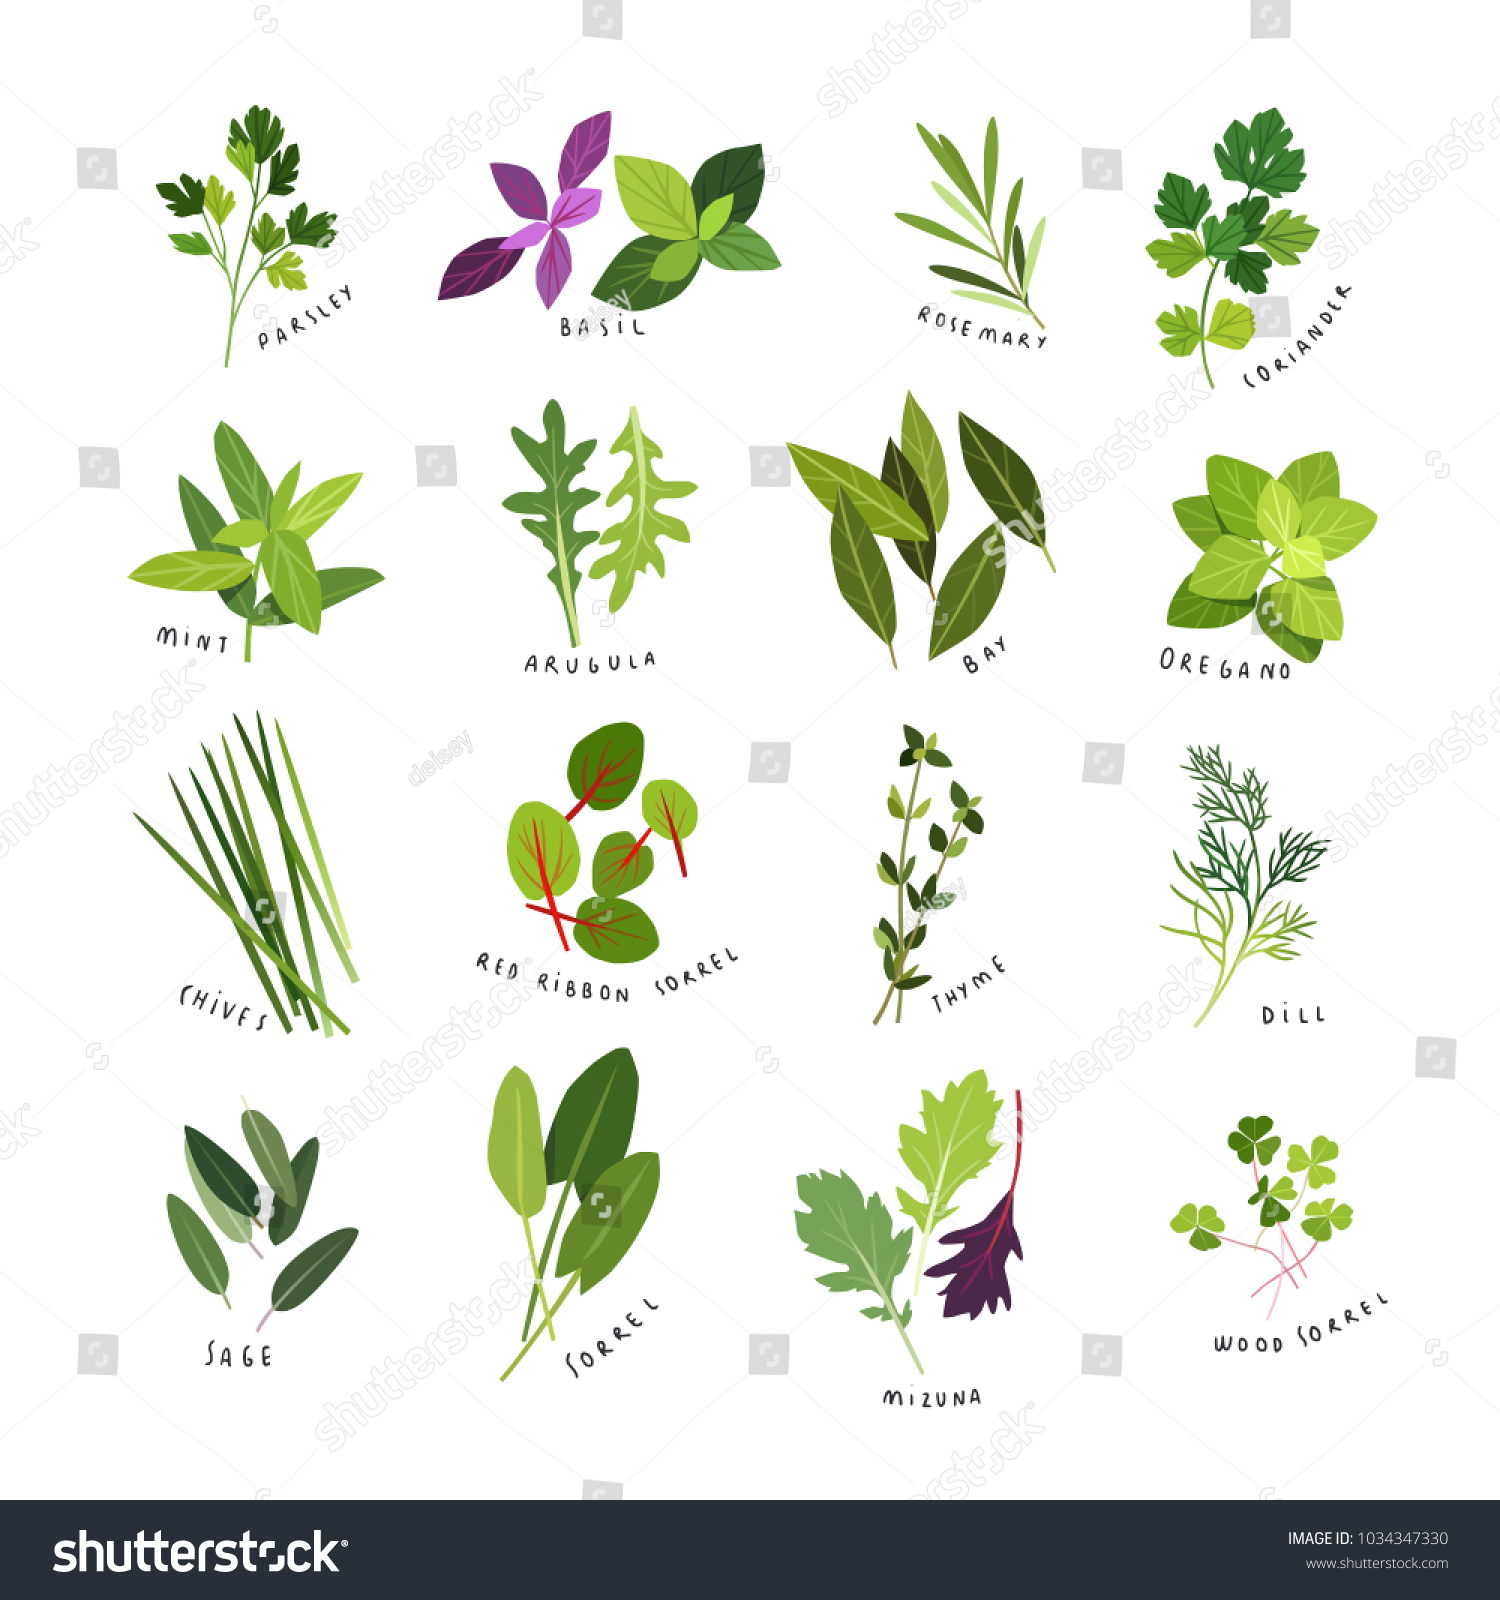 Clip art illustrations of herbs and spices such as parsley, basil, rosemary, coriander, mint, arugula, bay, oregano, chives, red ribbon sorrel, thyme, dill, sage, sorrel, mizuna and wood sorrel #1034347330